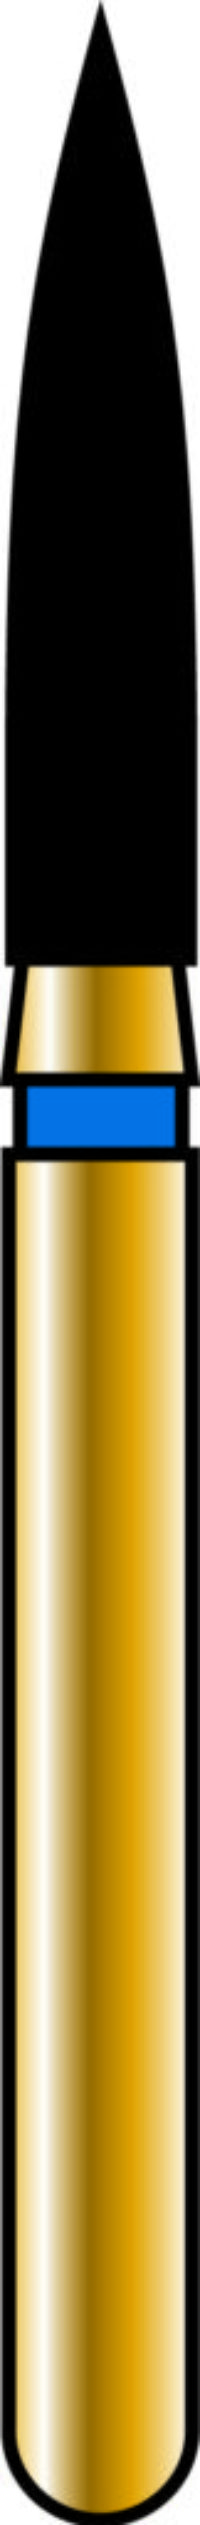 Flame 16-8mm Gold Diamond Bur